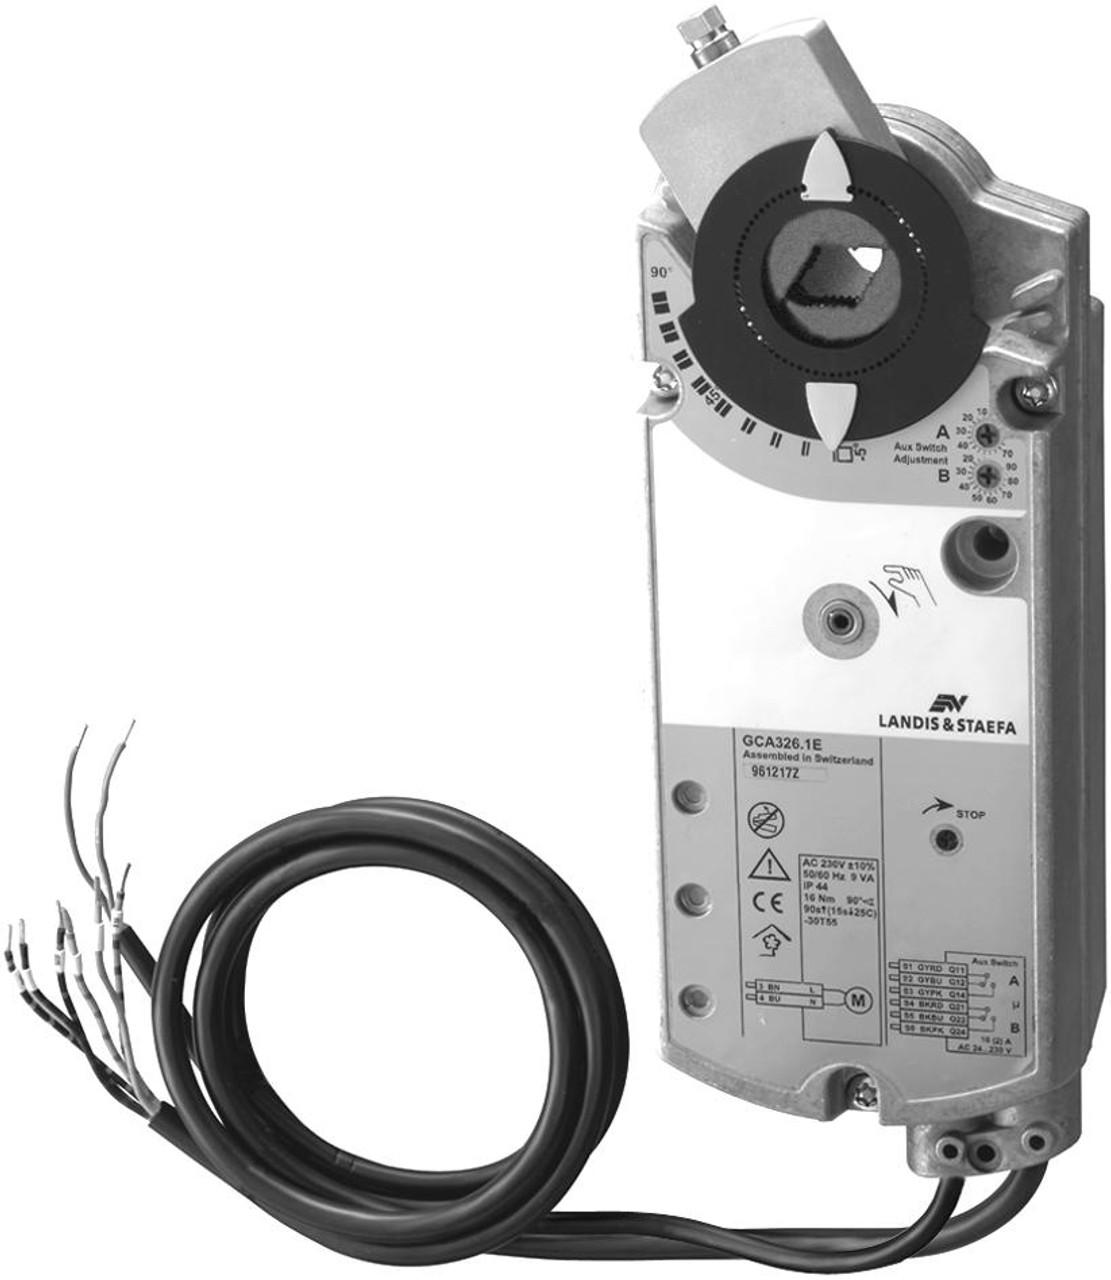 GCA166.1E rotary air damper actuator